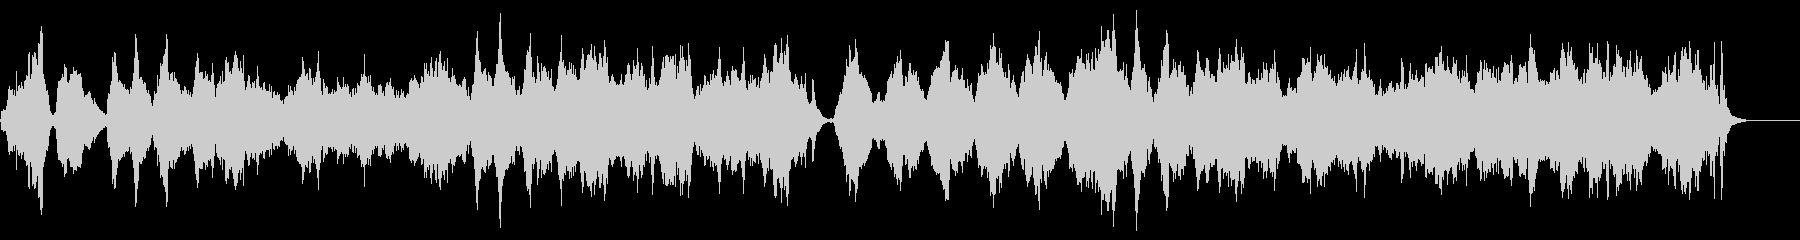 ◇ AUTUMN WALTZの未再生の波形